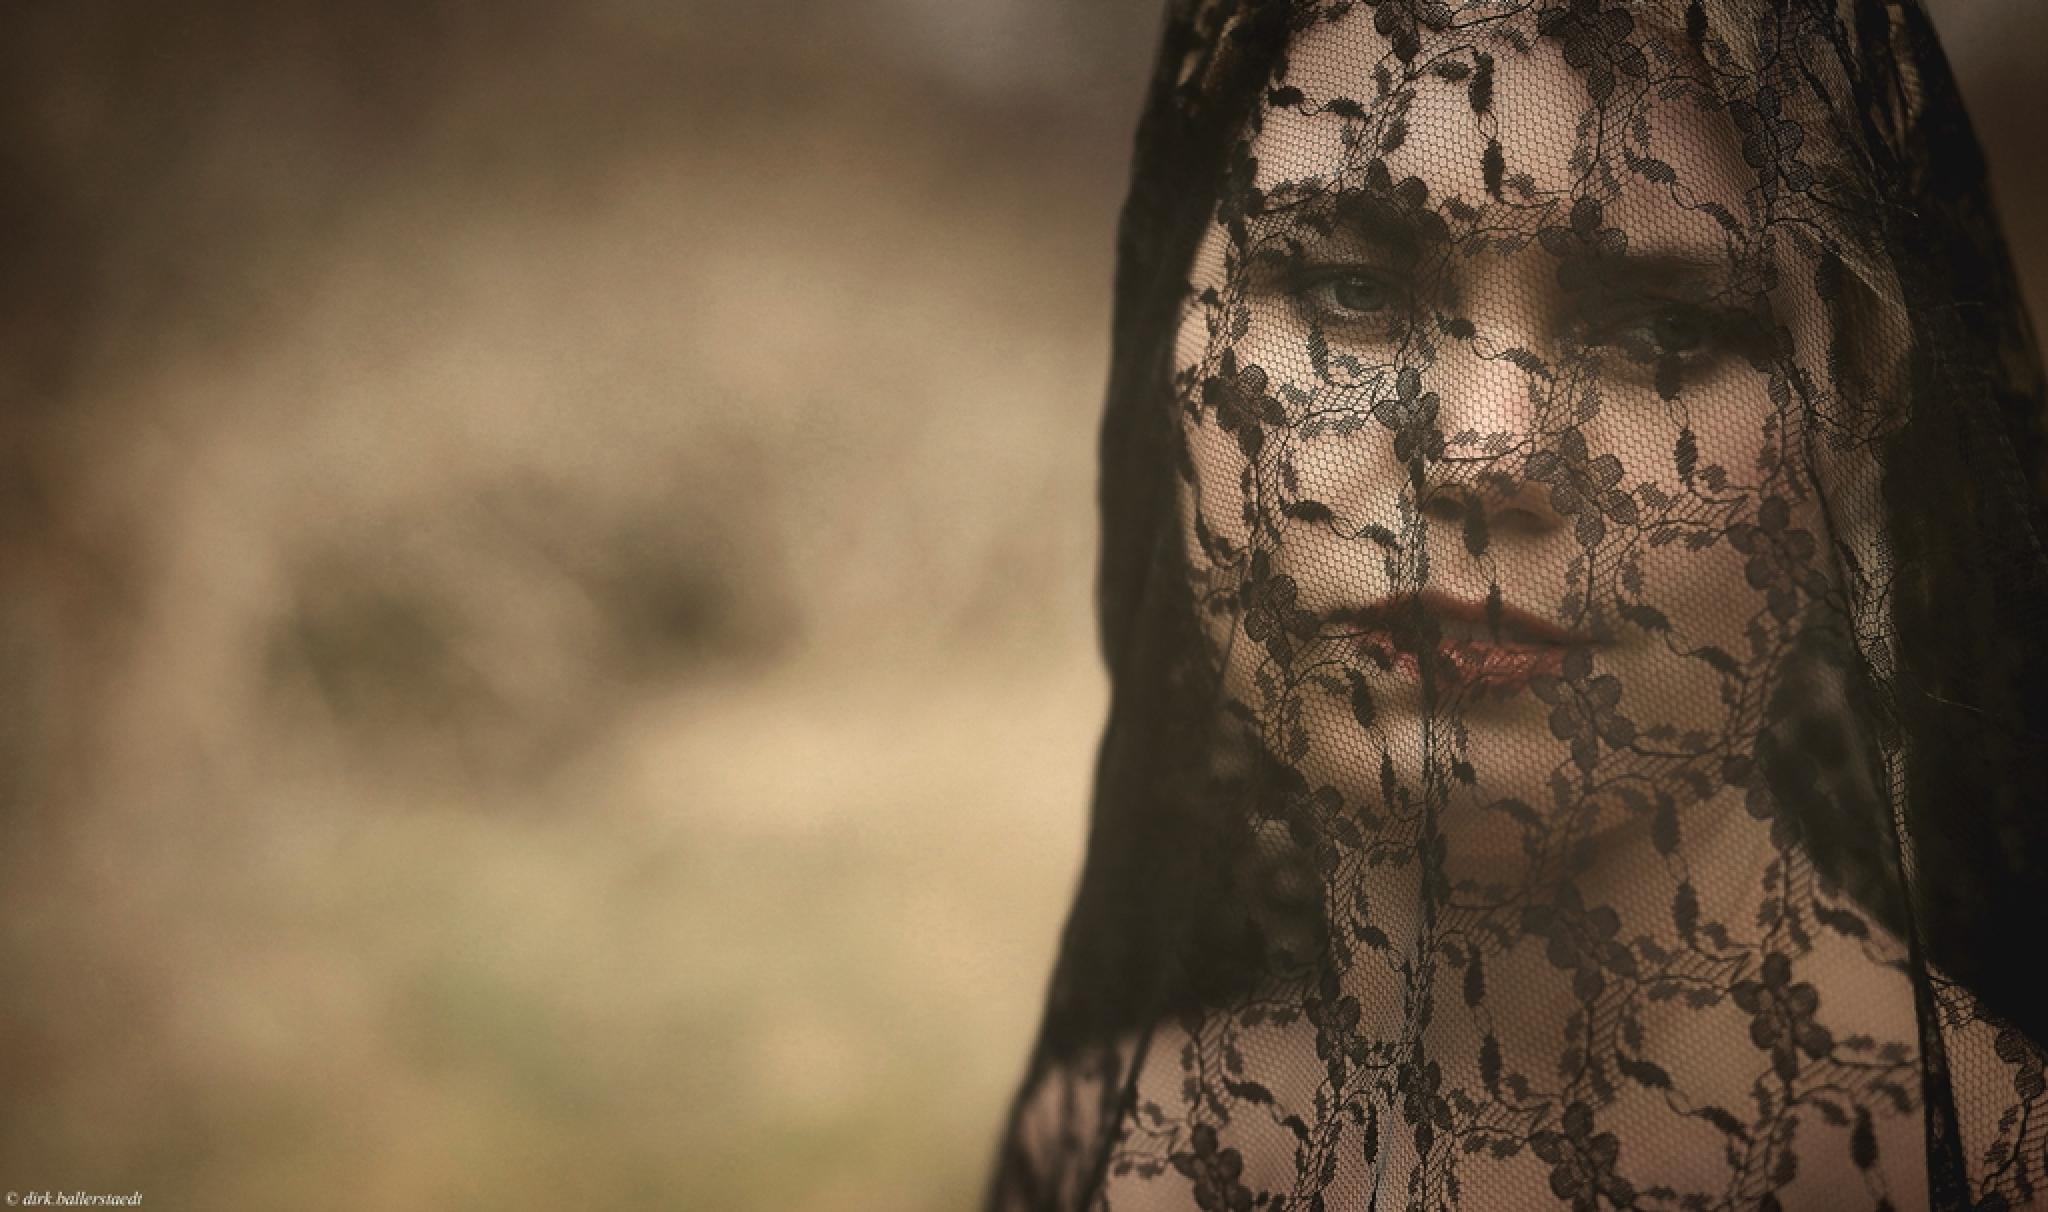 black widow II by rocksyou.photography